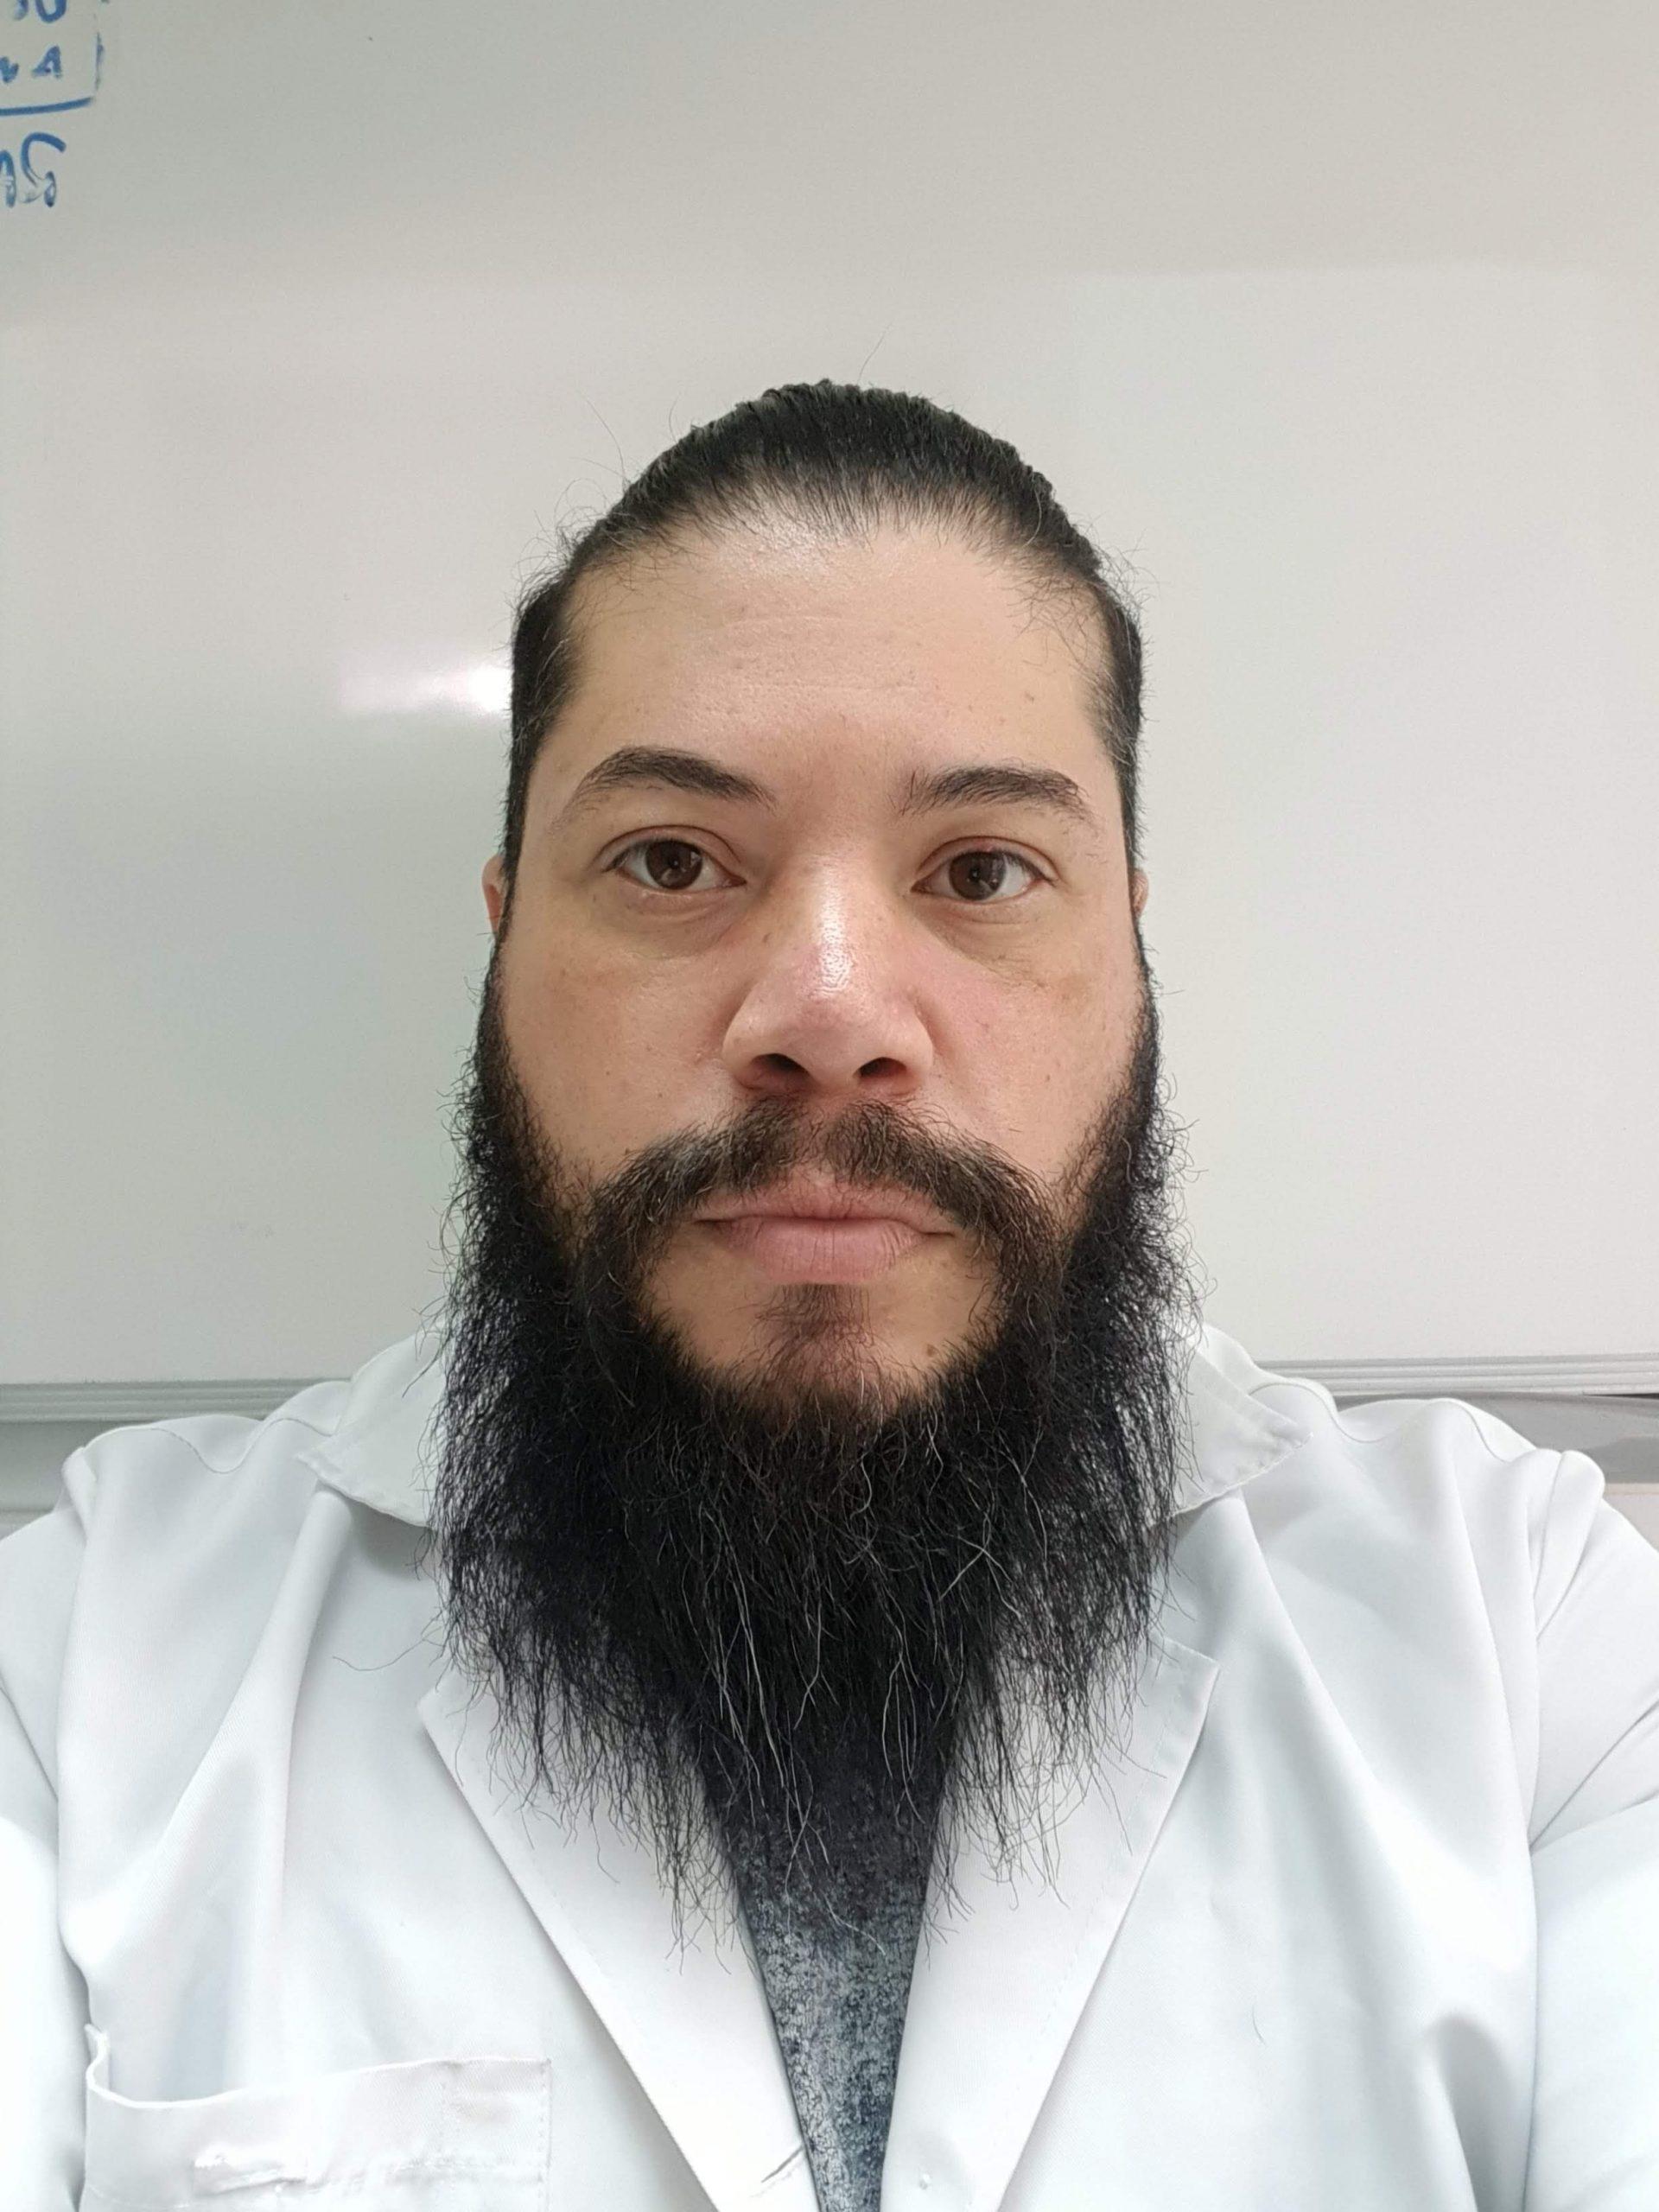 20190925_101605 - CRISTIANO DE JESUS CORREIA